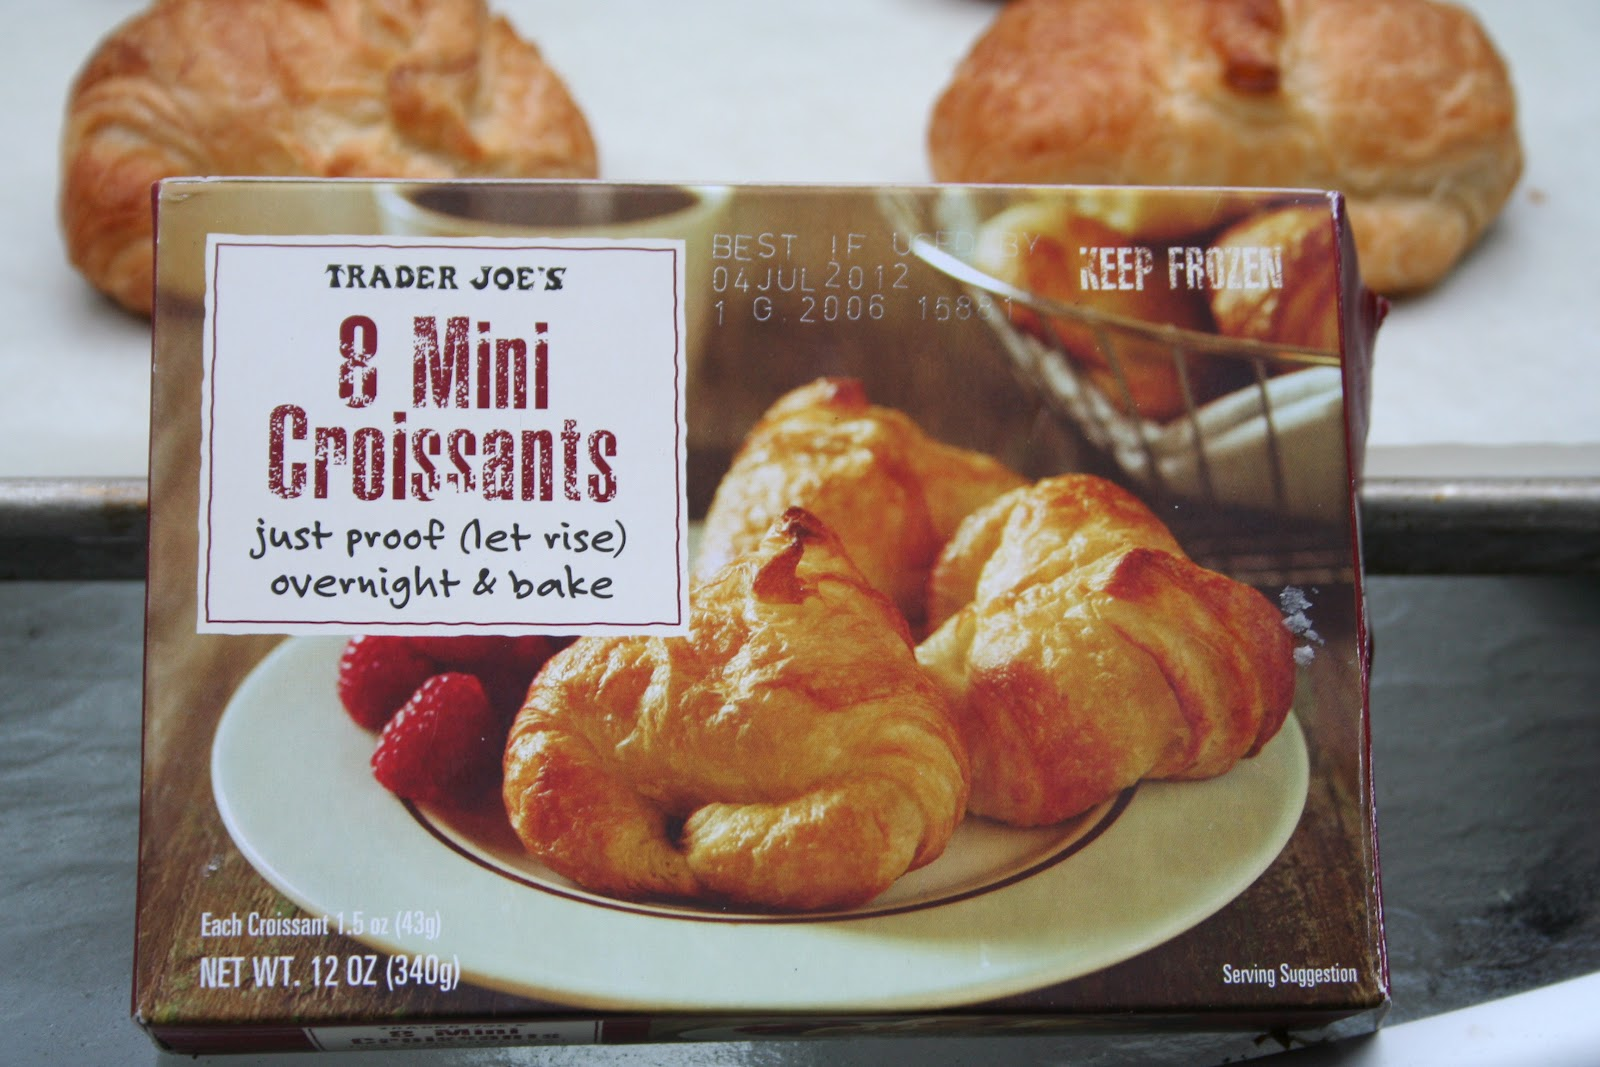 Trader Joe's 8 Mini Croissants